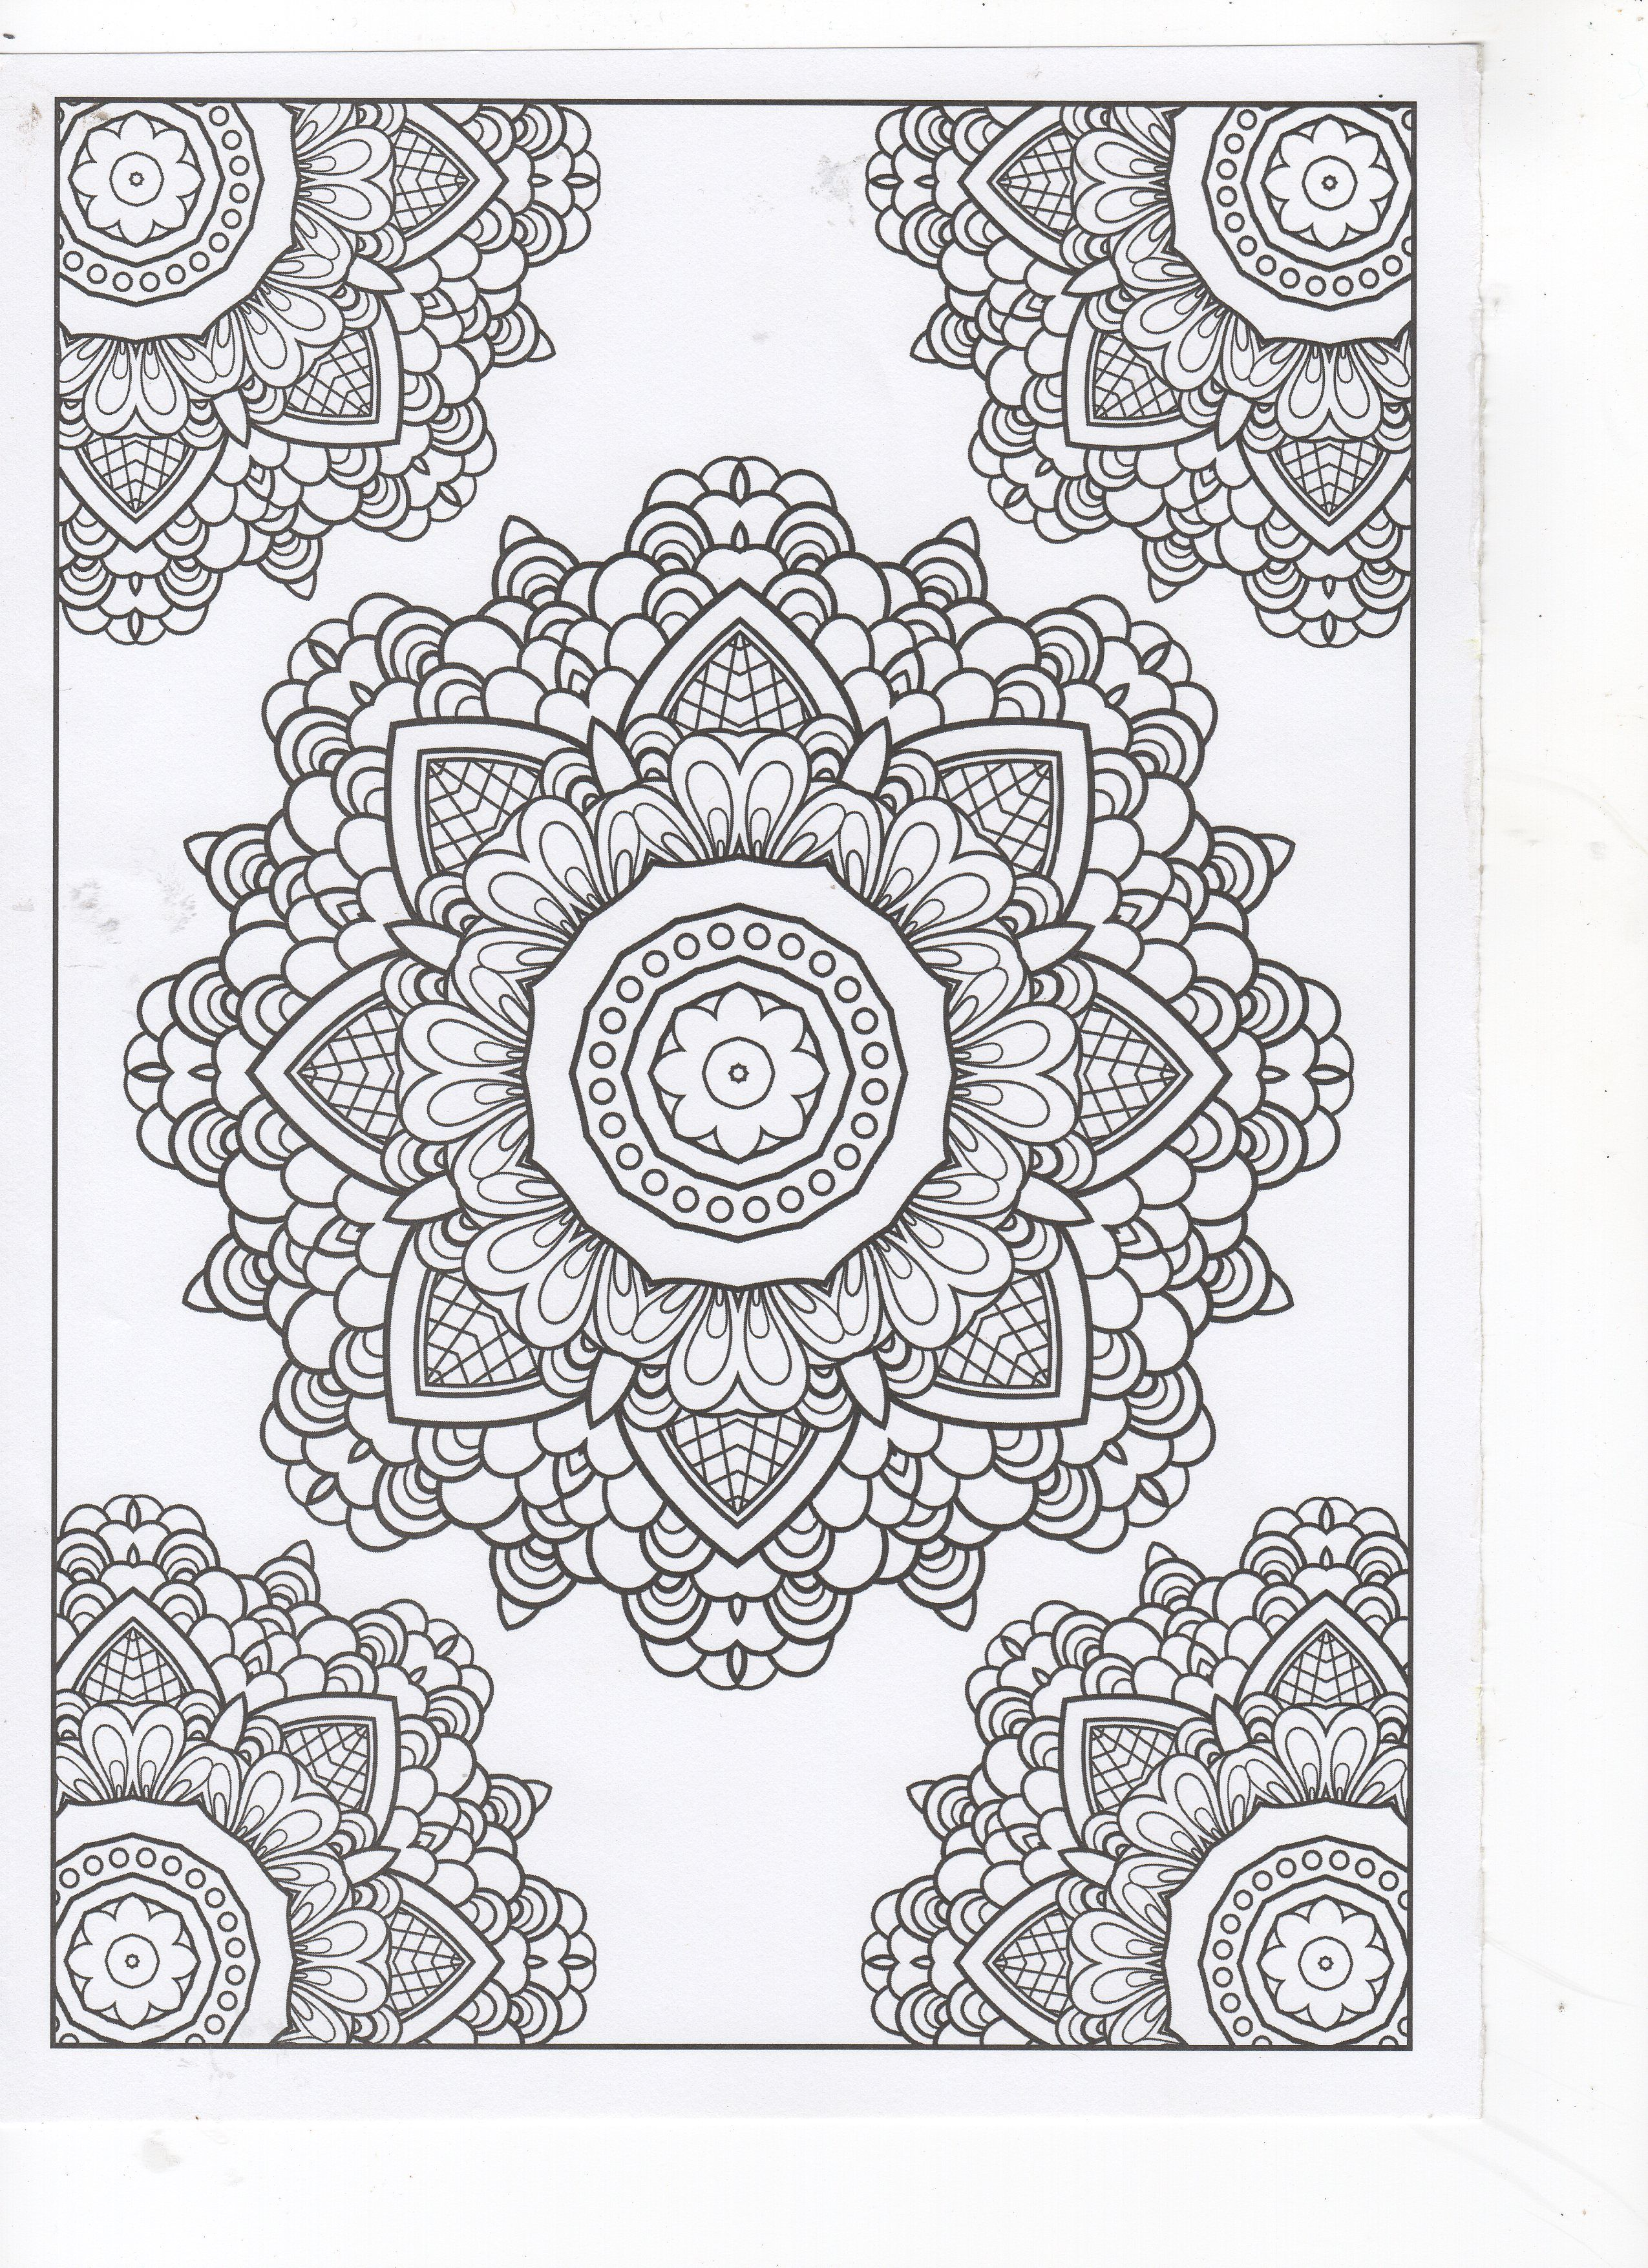 Super Buenas Mandalas Coloring Pages Coloring Books Pattern Illustration